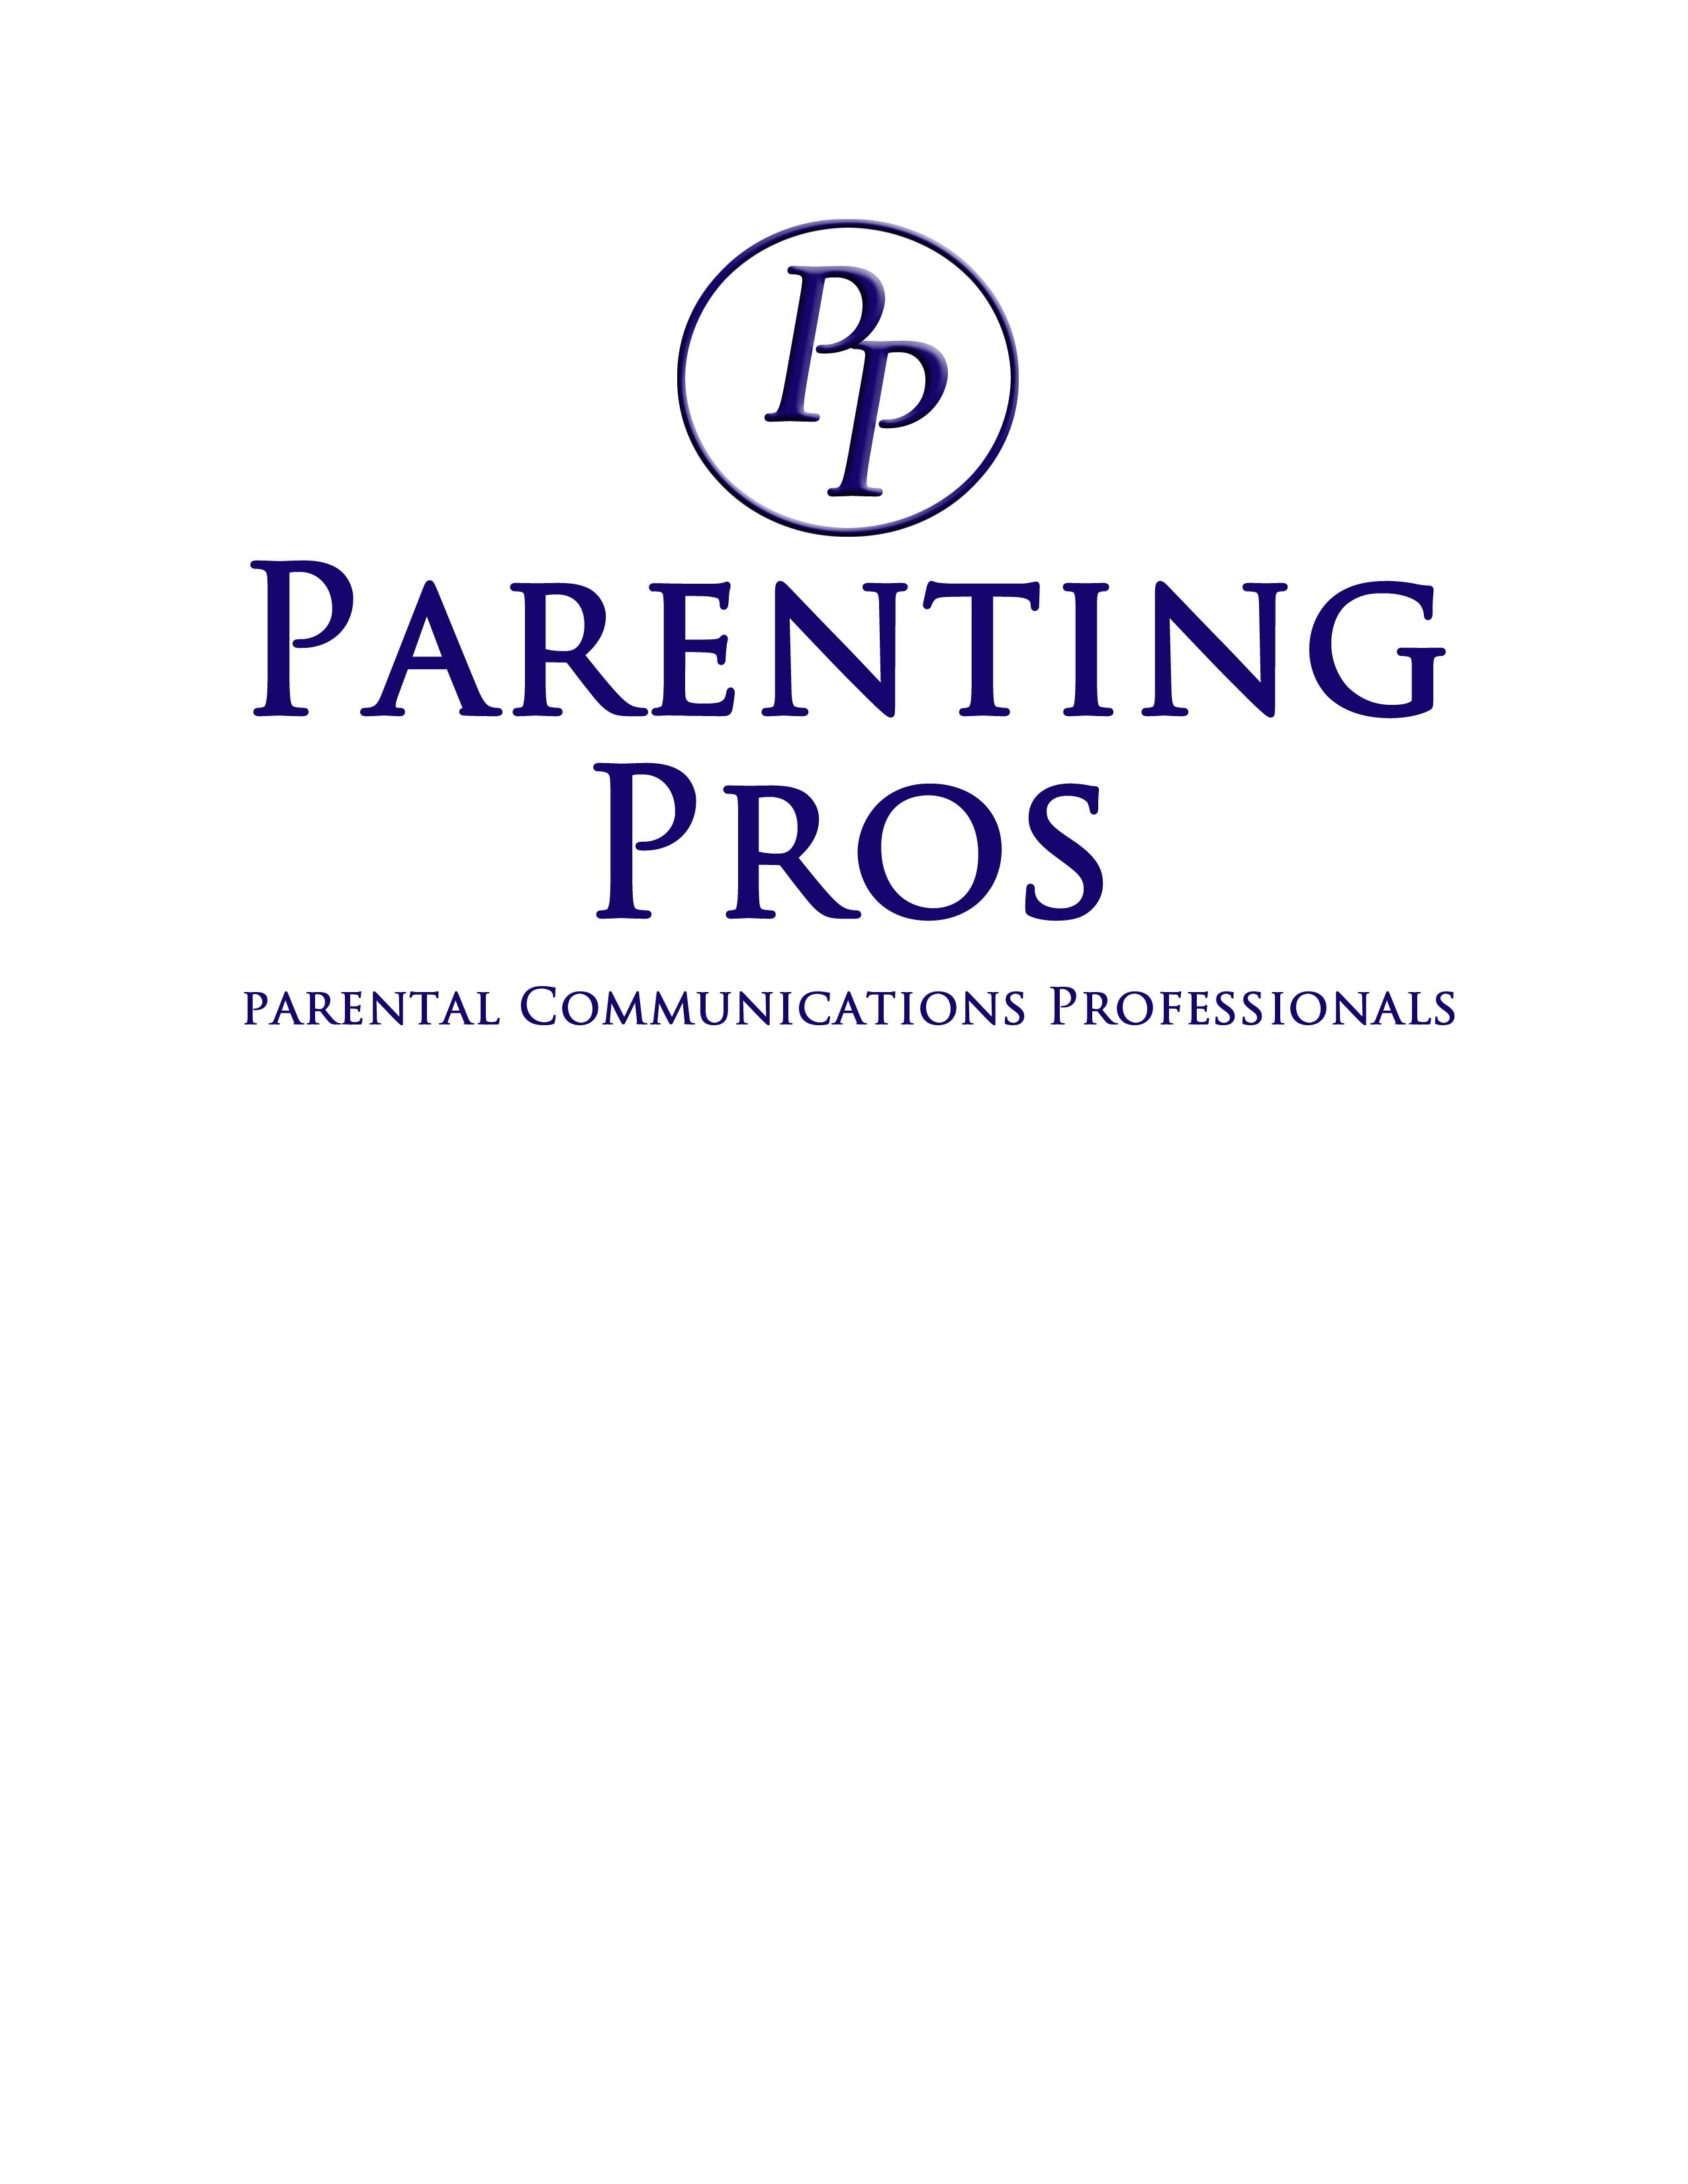 ParentingPros logo001